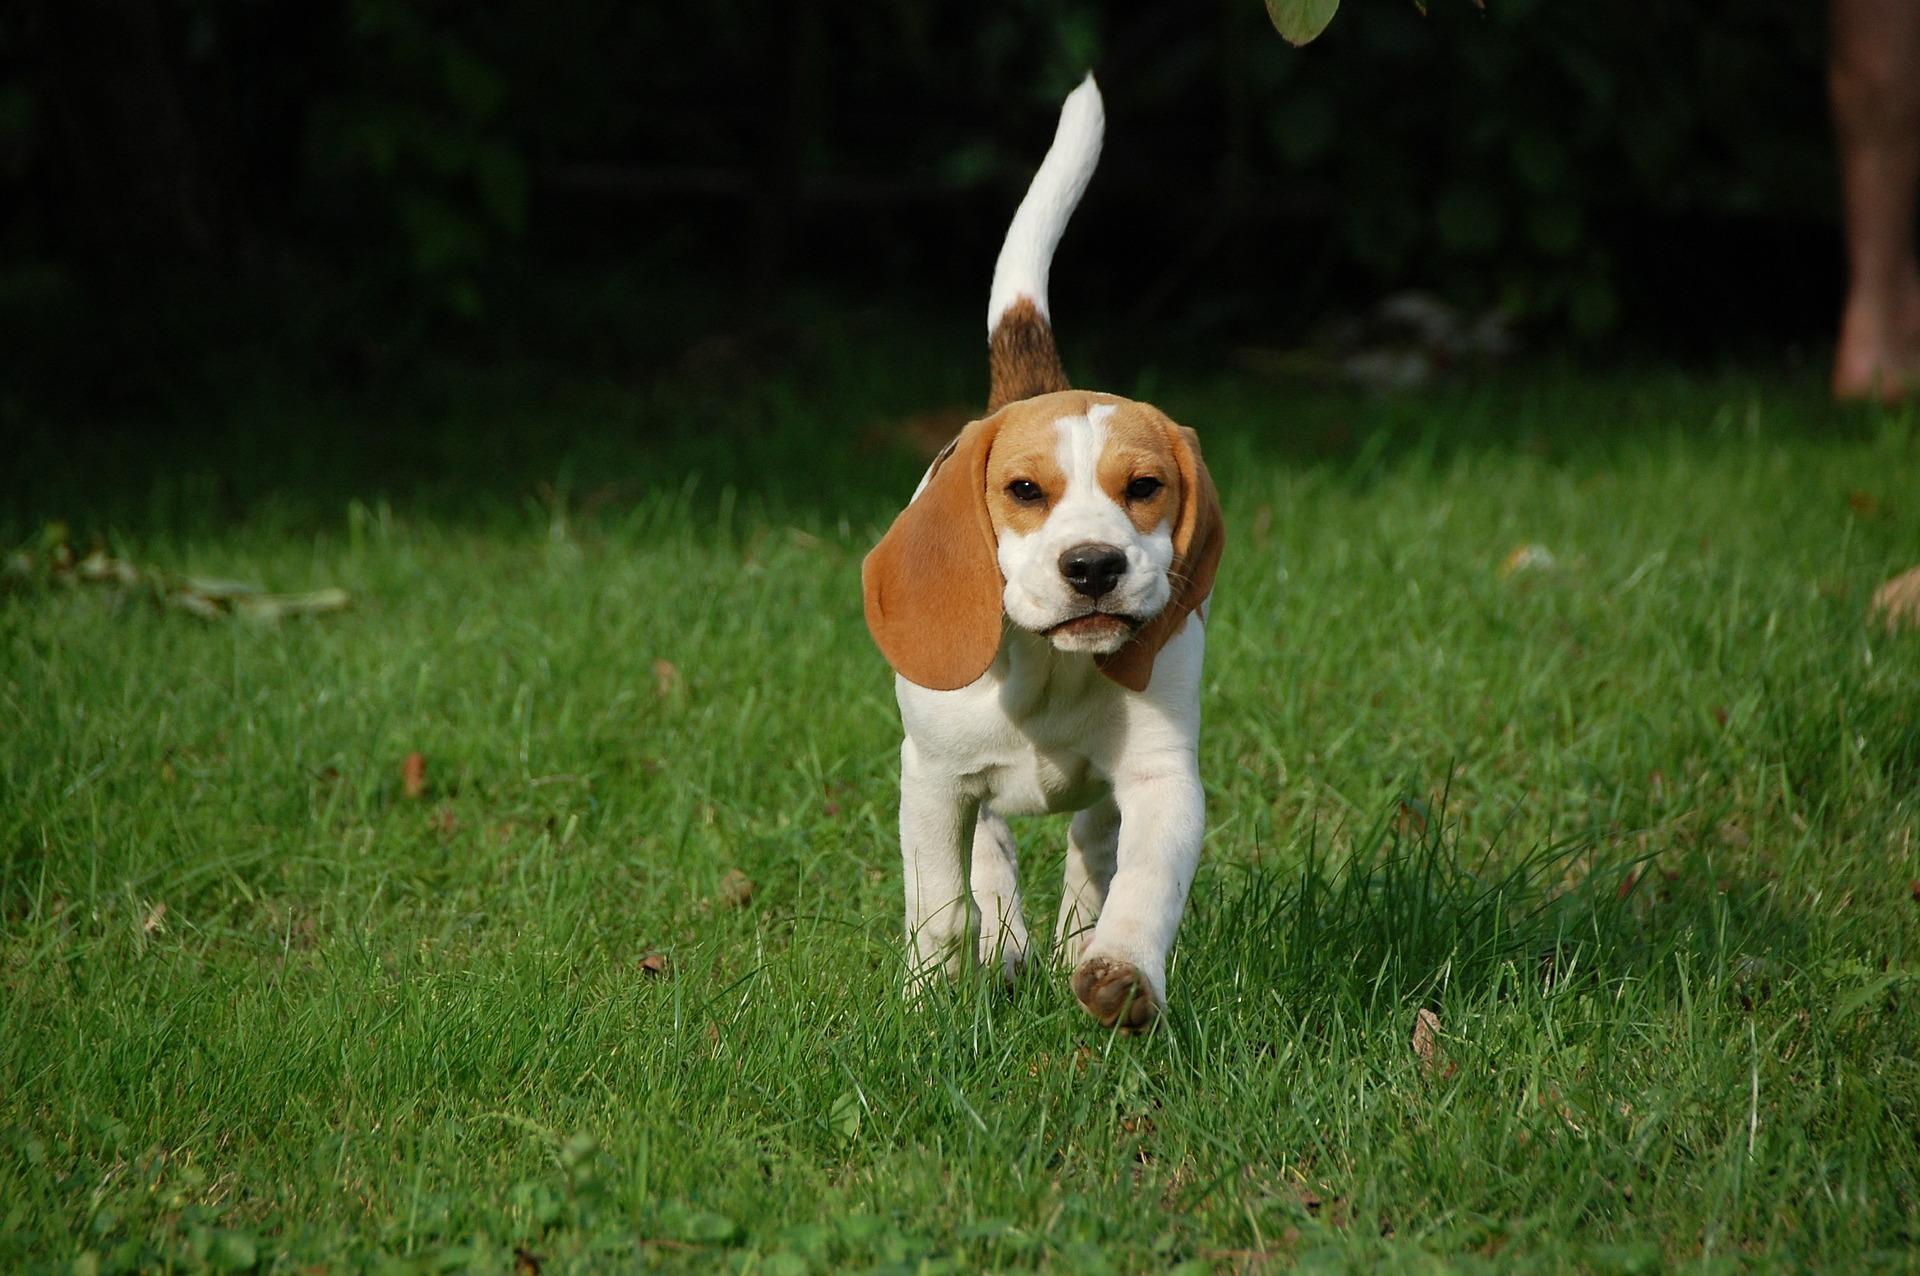 Small Dogs Like Beagles